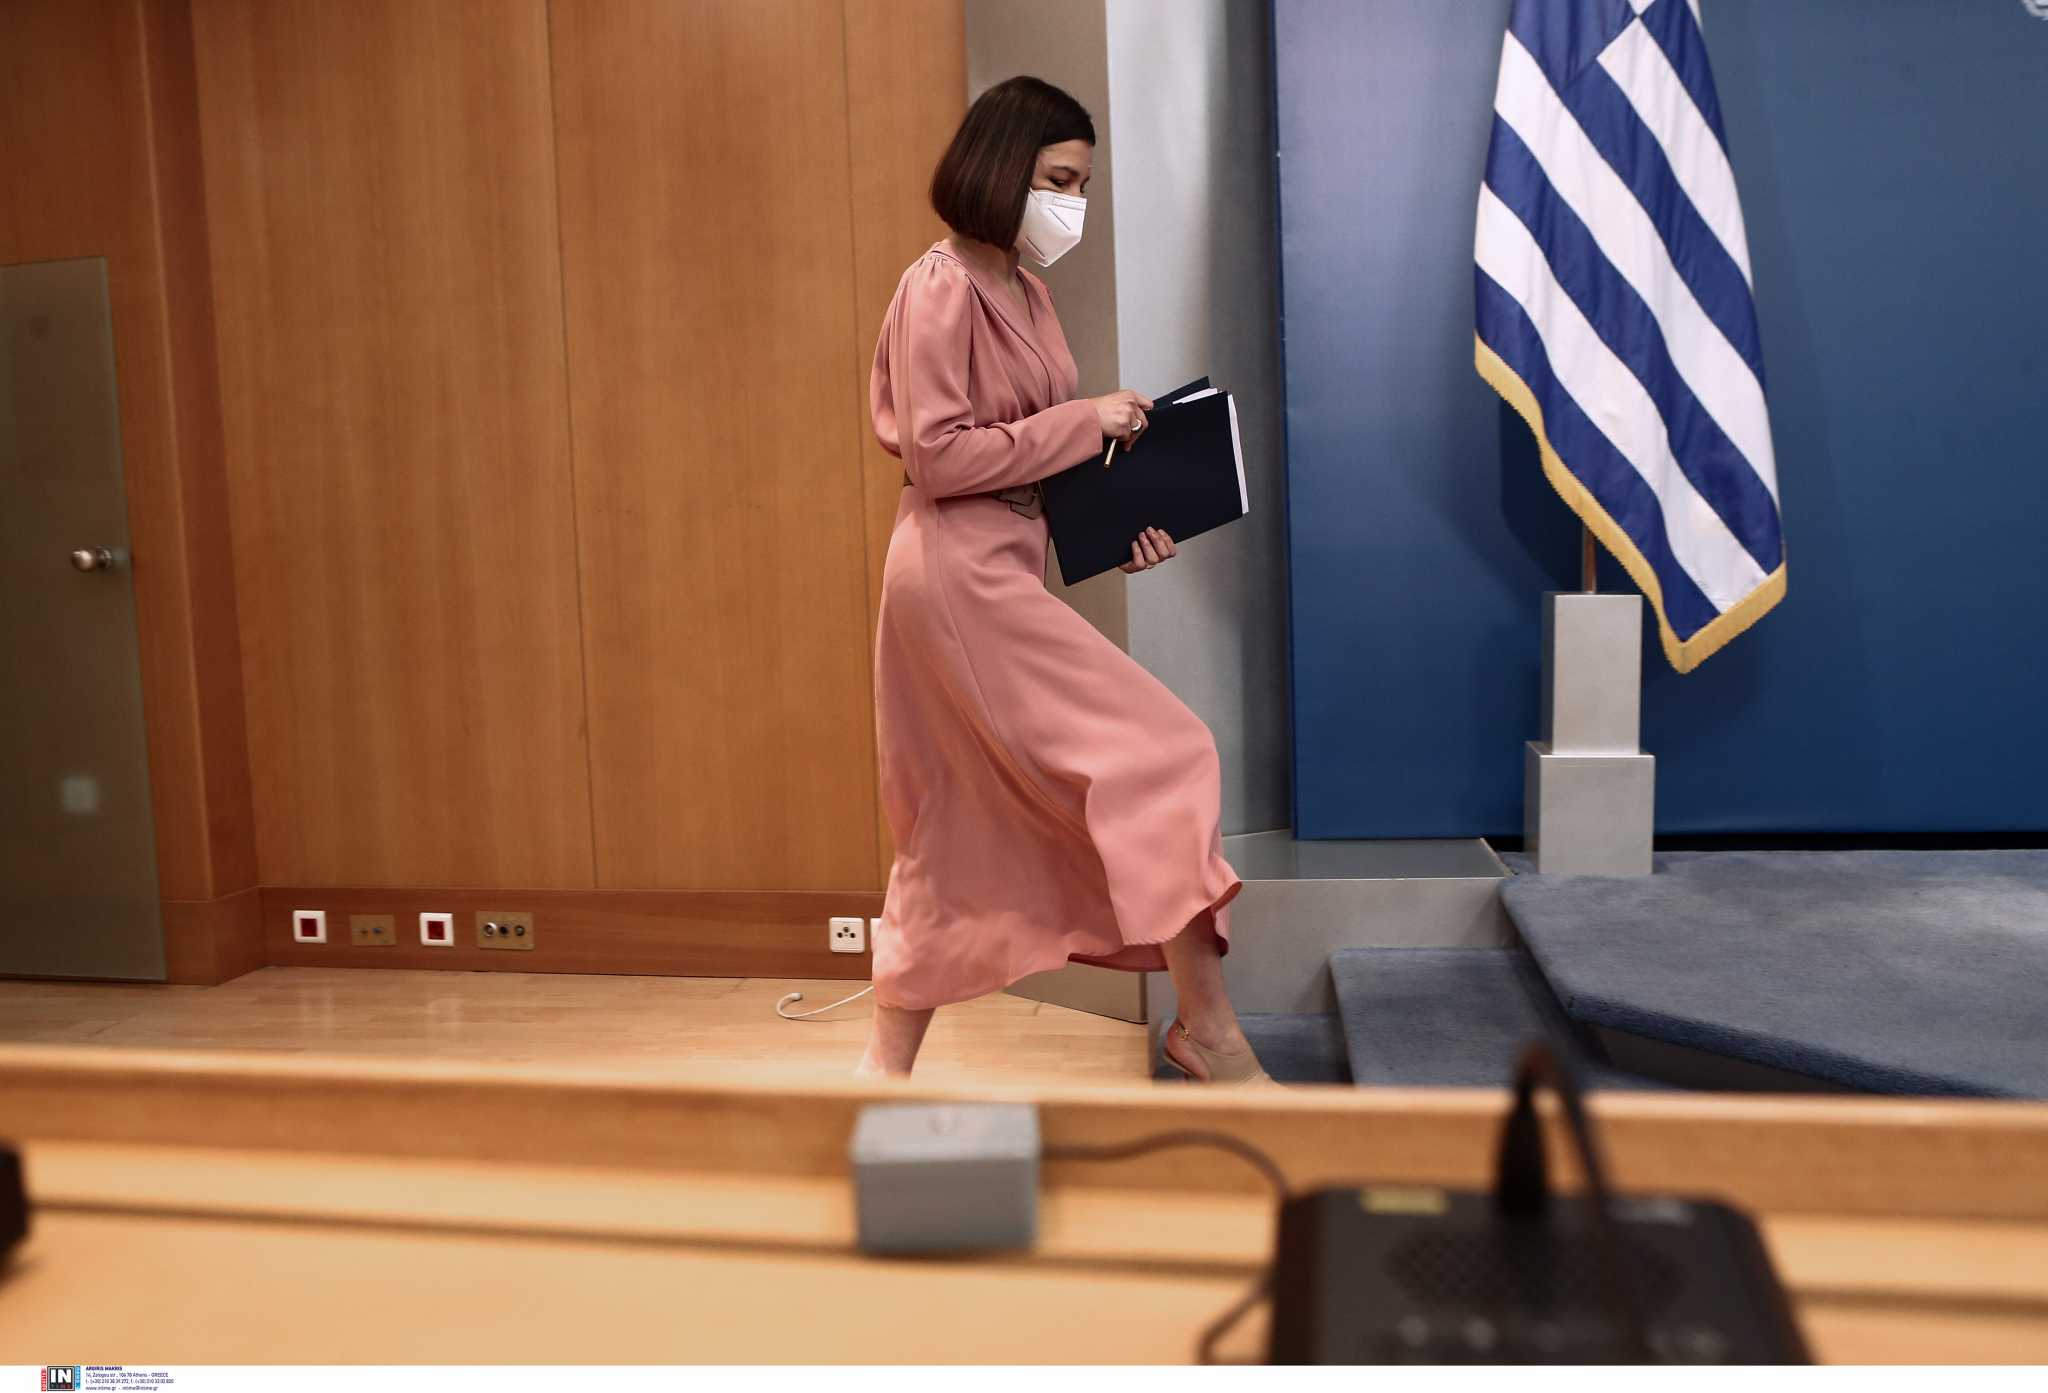 Live: Η ενημέρωση από την κυβερνητική εκπρόσωπο Αριστοτελία Πελώνη σήμερα 27/05